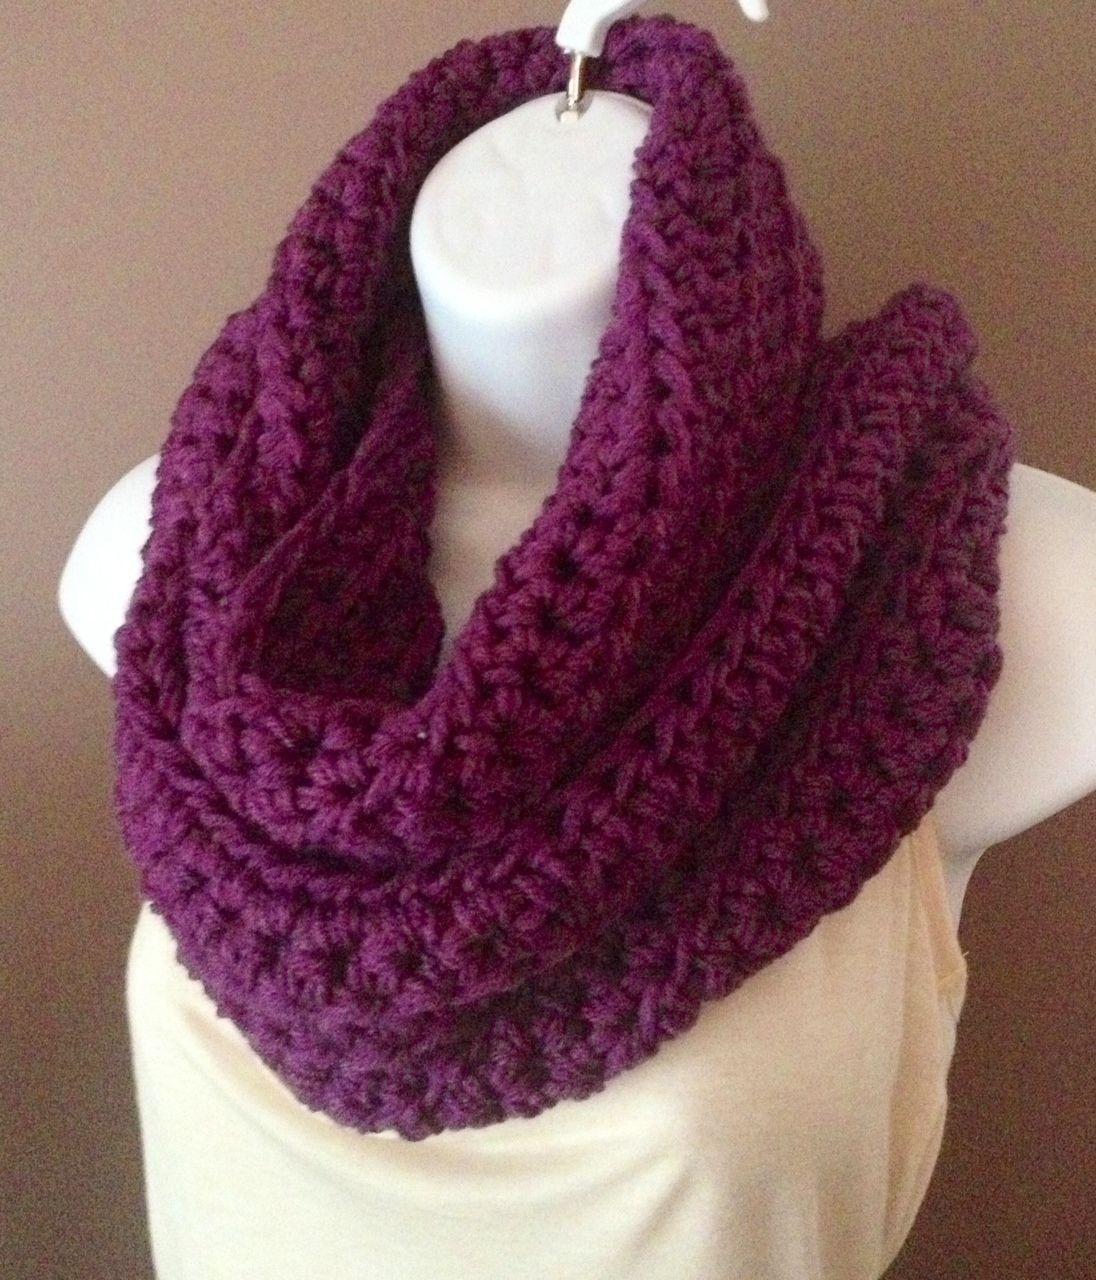 Crochet Bufanda morada | Proyectos que intentar | Pinterest ...